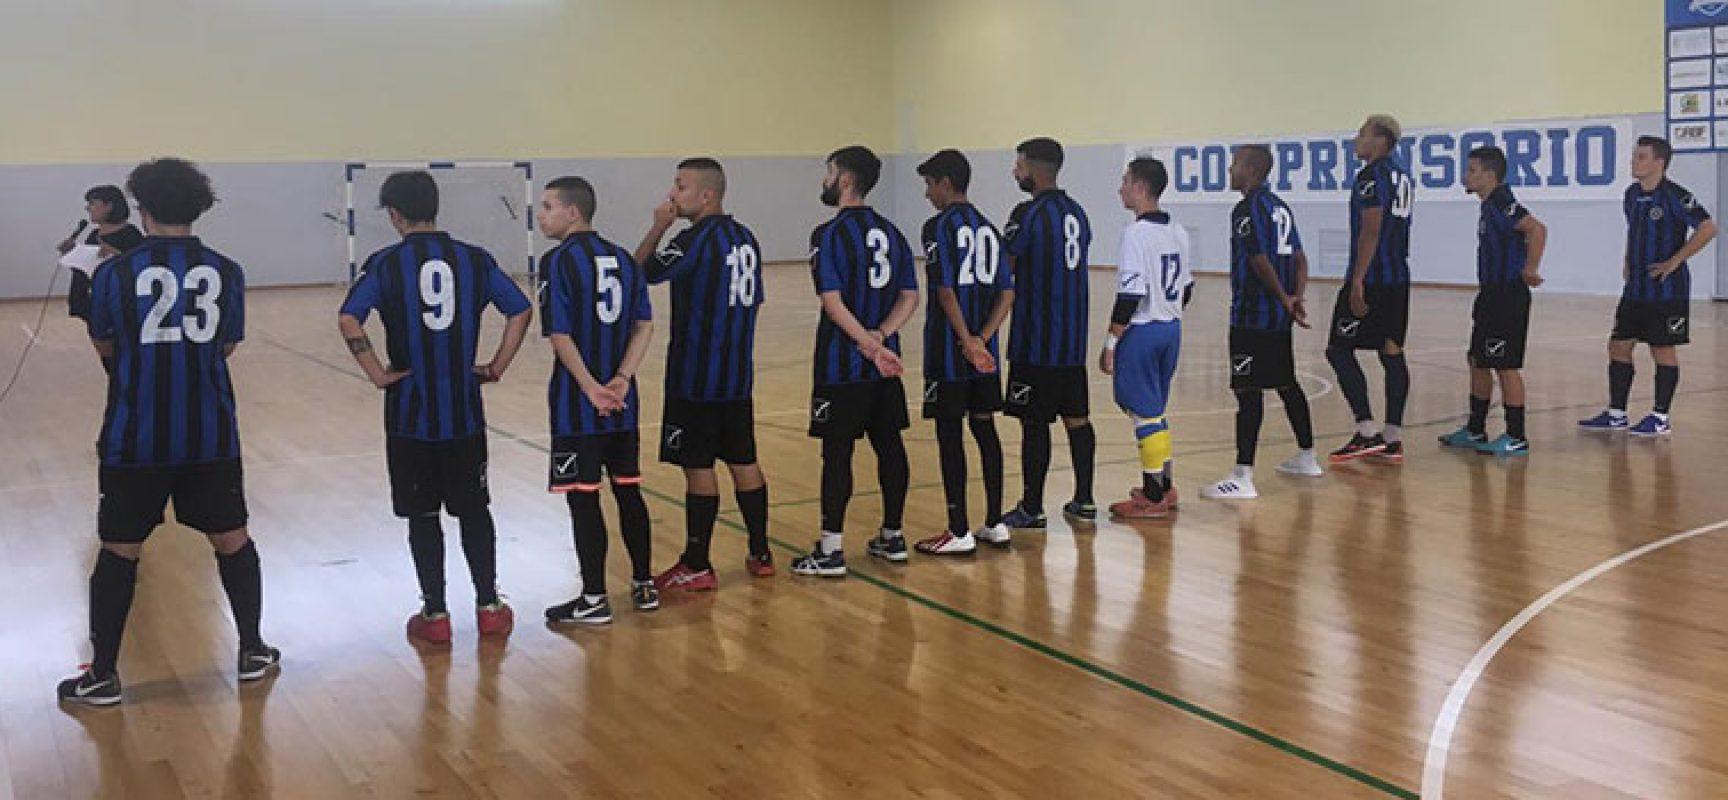 Divisione Calcio A 5 Ufficializza Classifiche Definitive Futsal Bisceglie Retrocede In Serie B Bisceglie24